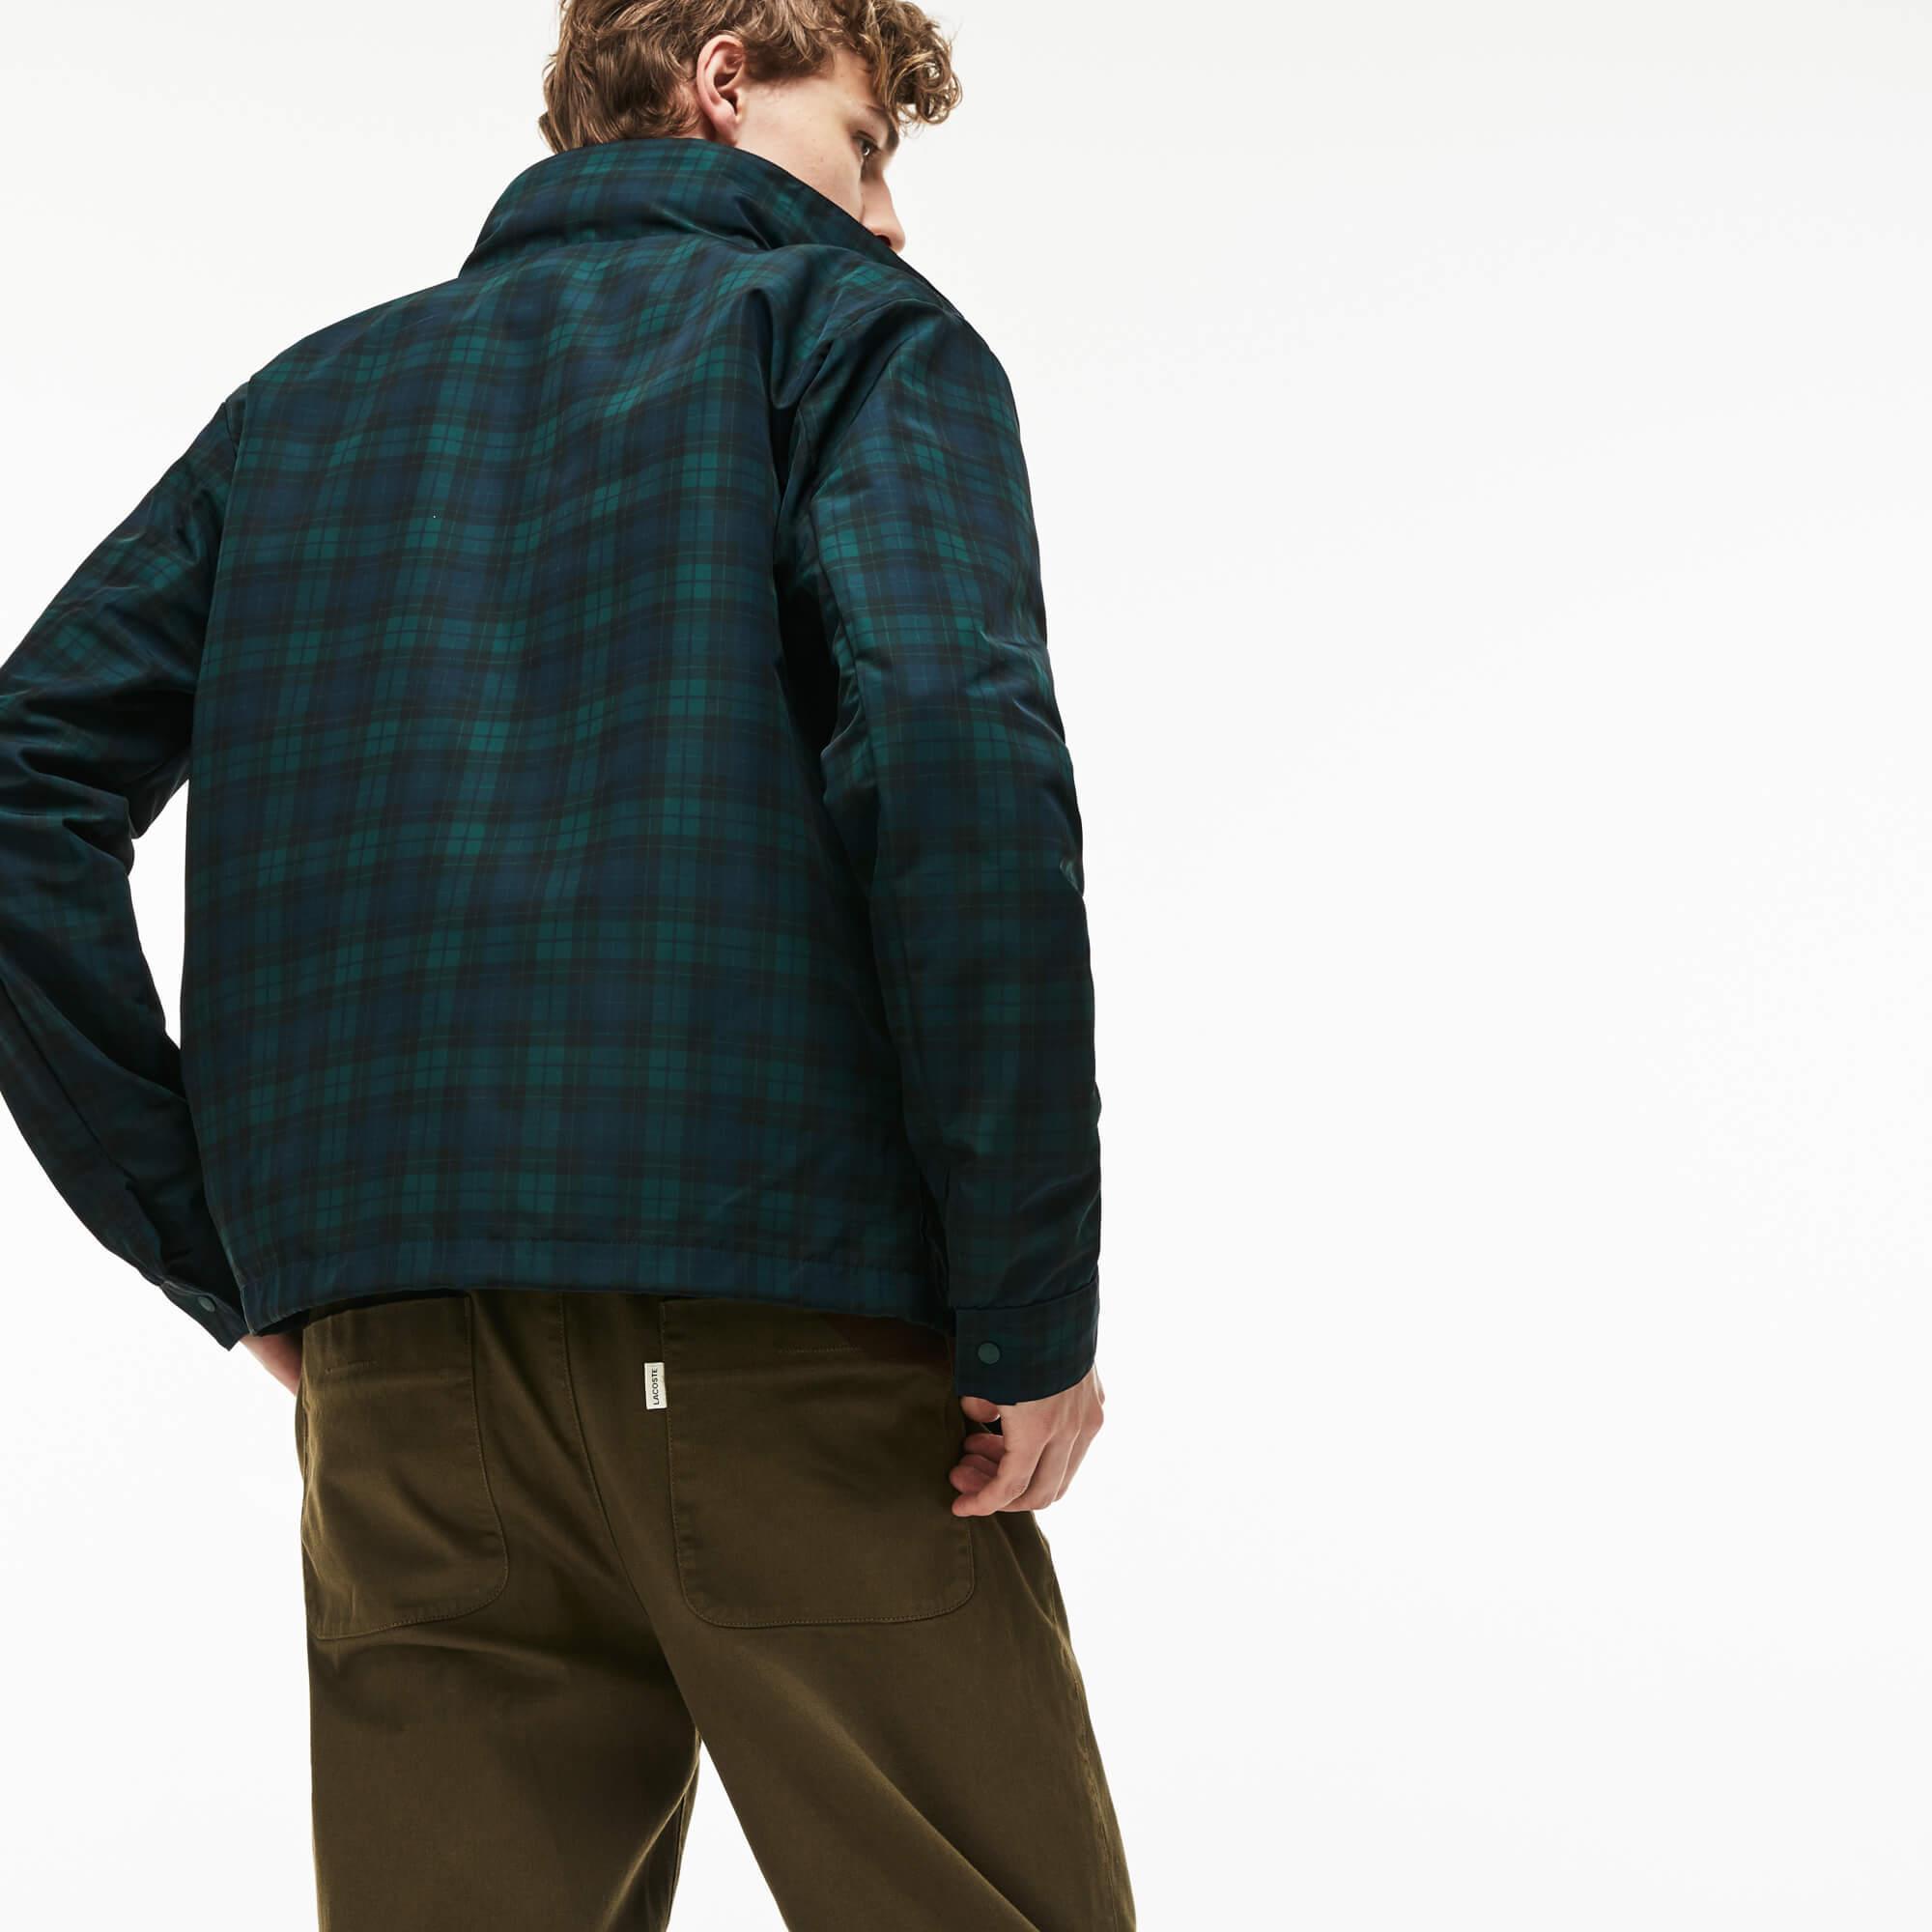 Lacoste Erkek Lacivert-Yeşil Mont